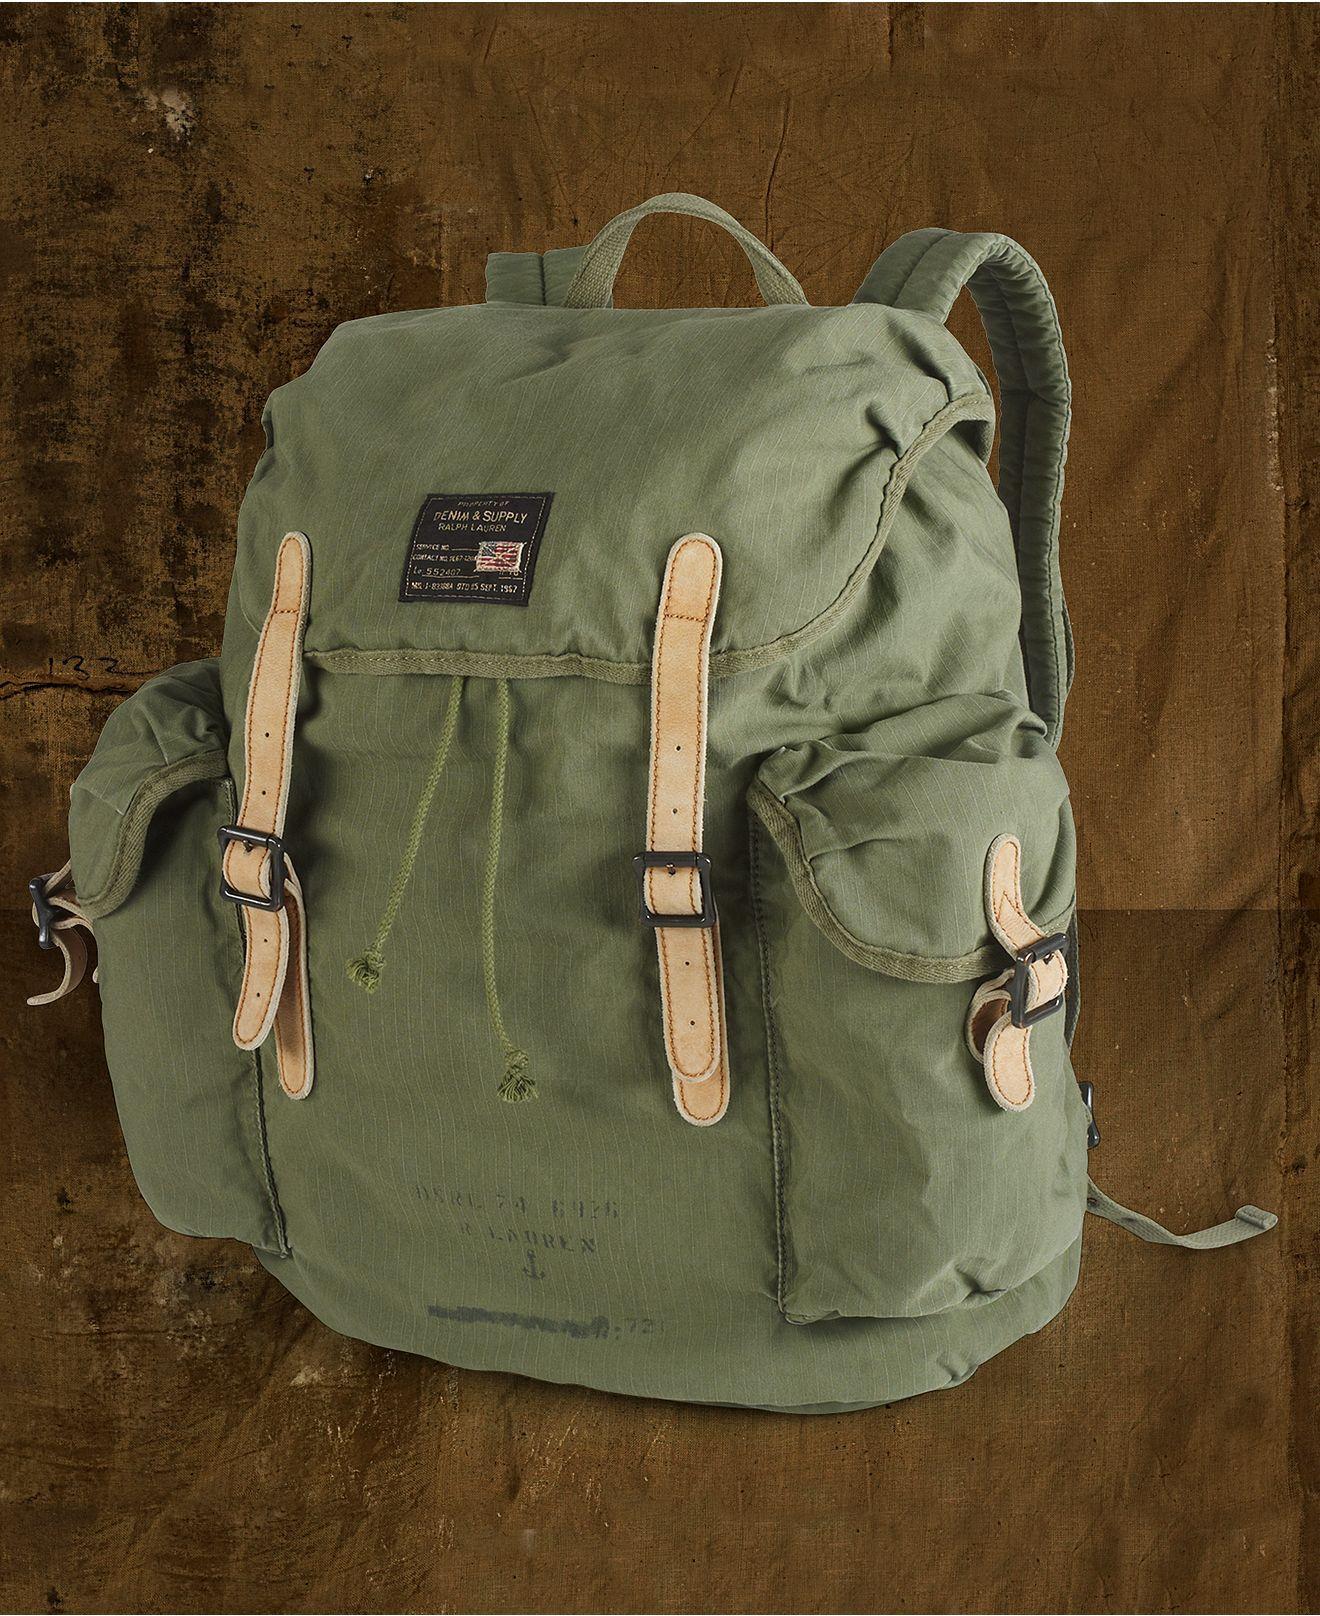 b7e0df99ceb7a Denim   Supply Ralph Lauren Bag